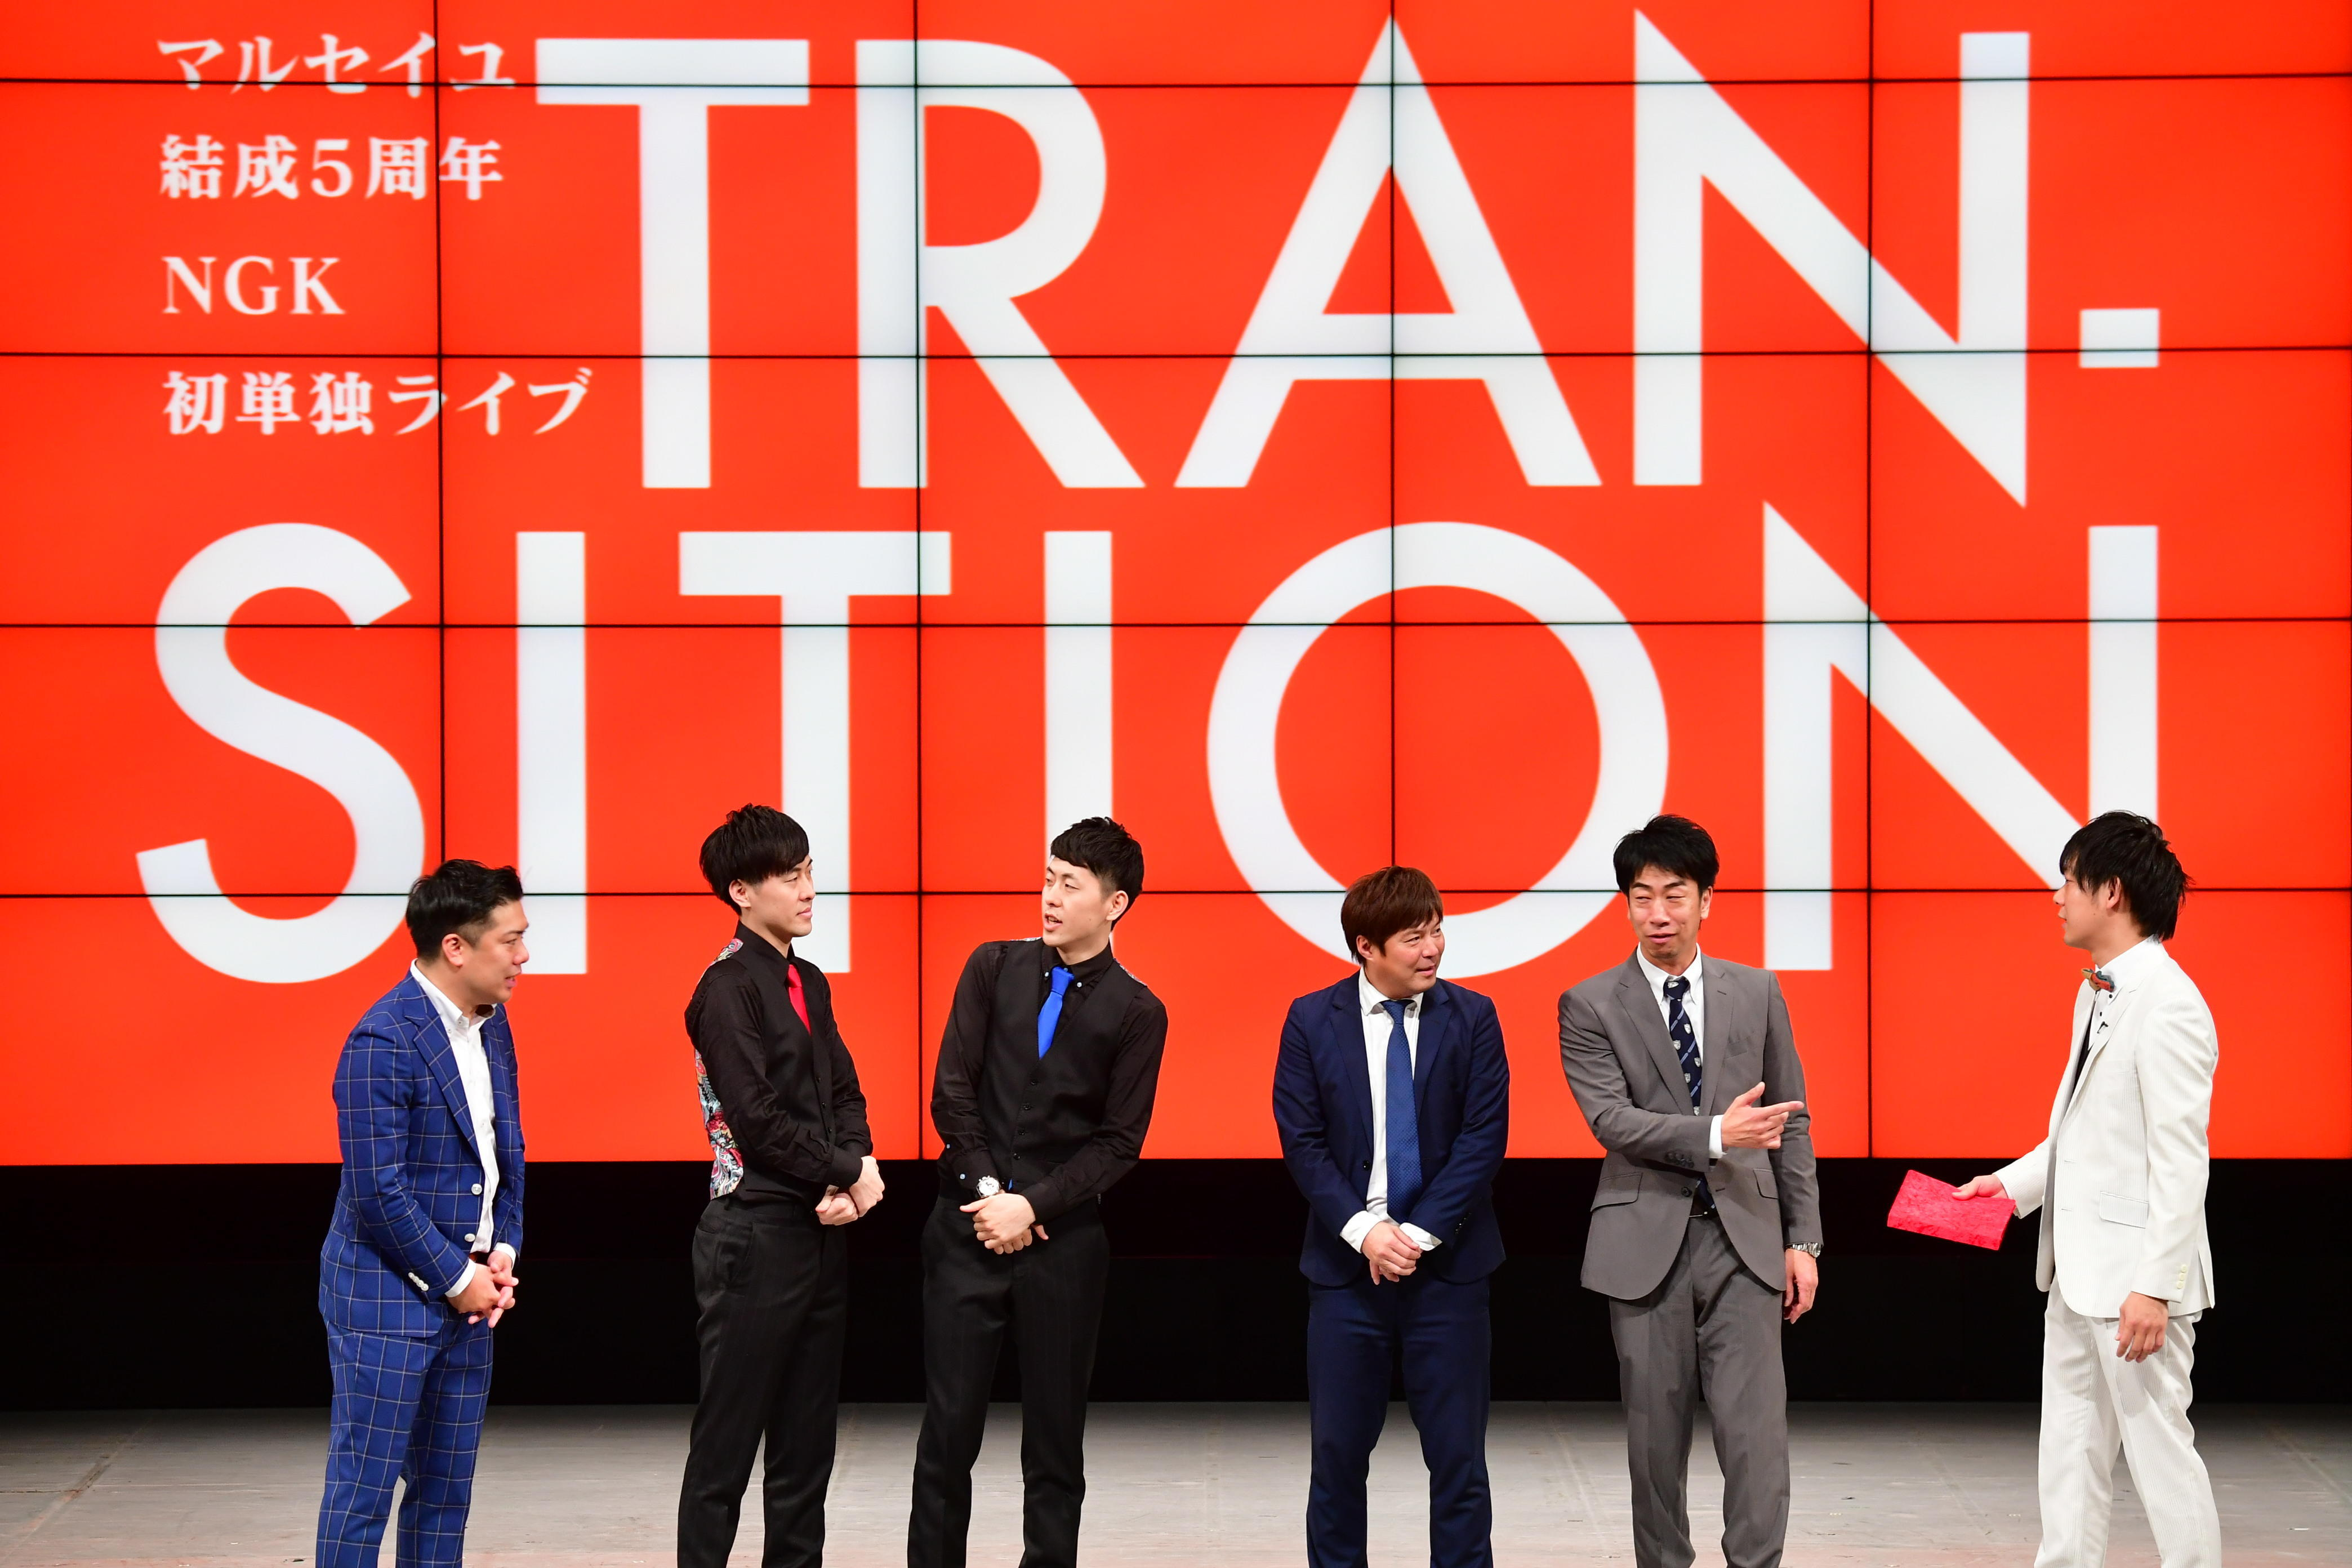 http://news.yoshimoto.co.jp/20190128184644-834805d97de8ad198d84c62c6272b81bbe828d5c.jpg